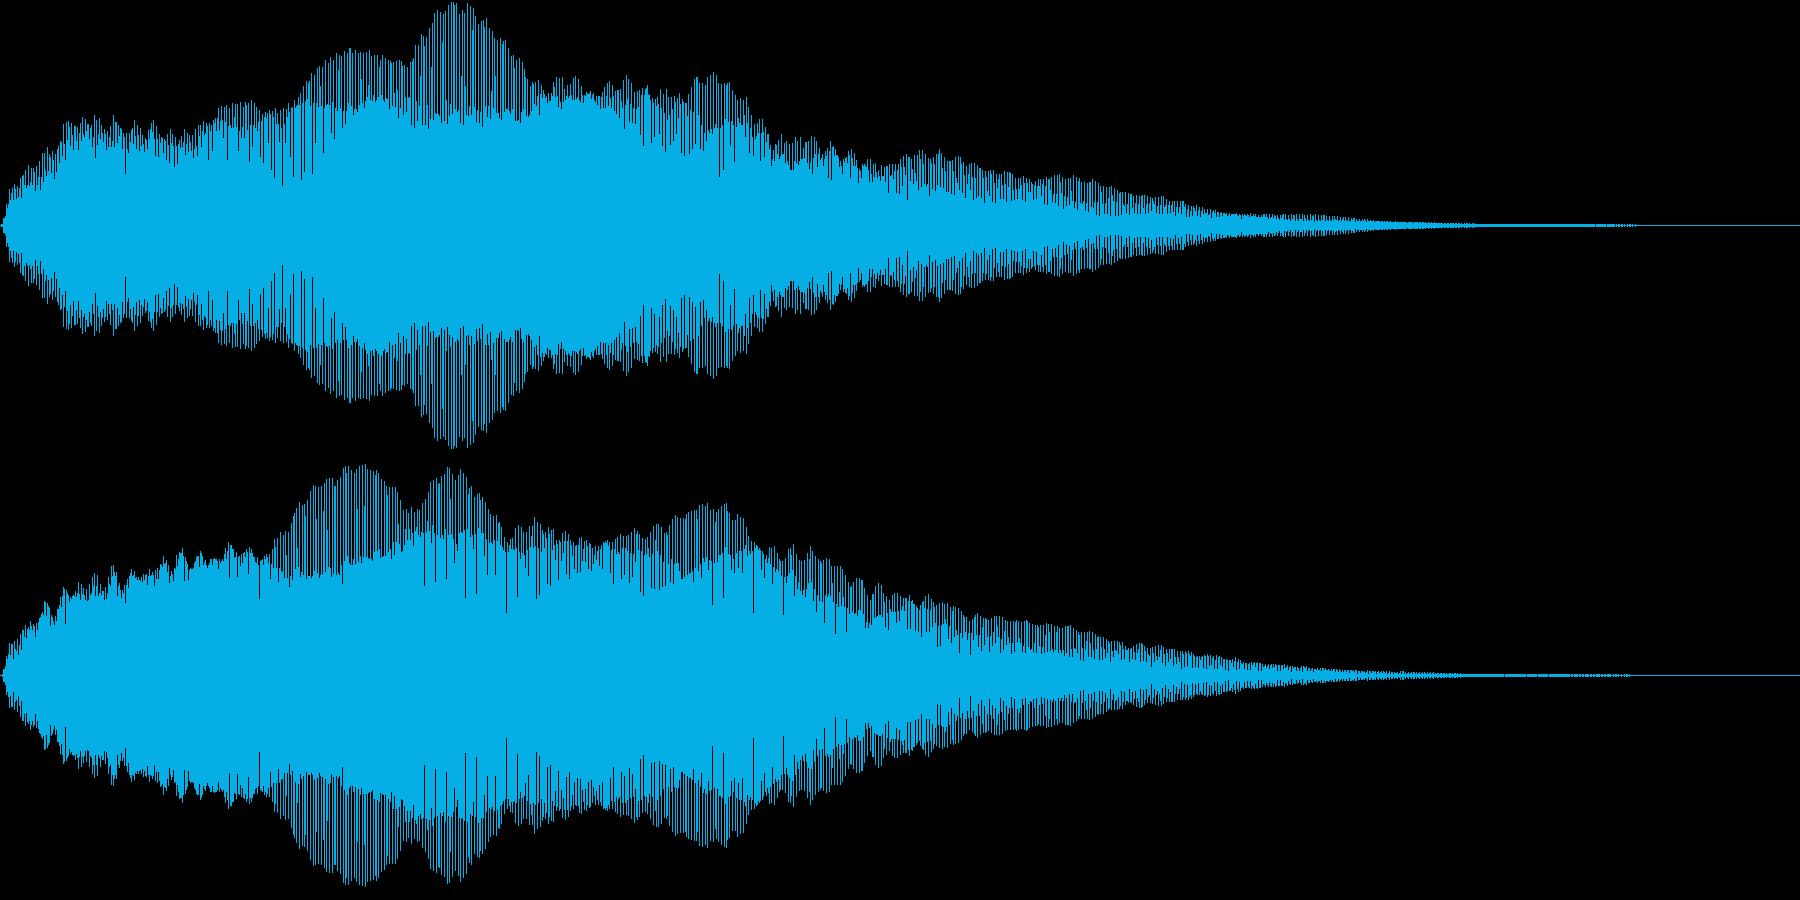 SFテイストなタイトルシーンの再生済みの波形